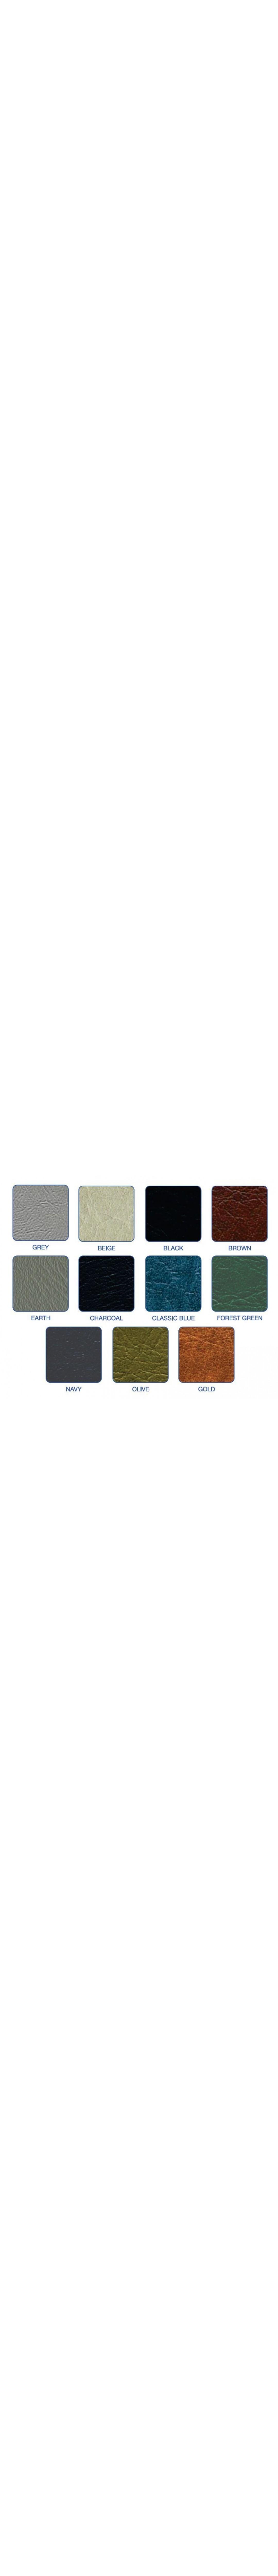 Cover Colour Options